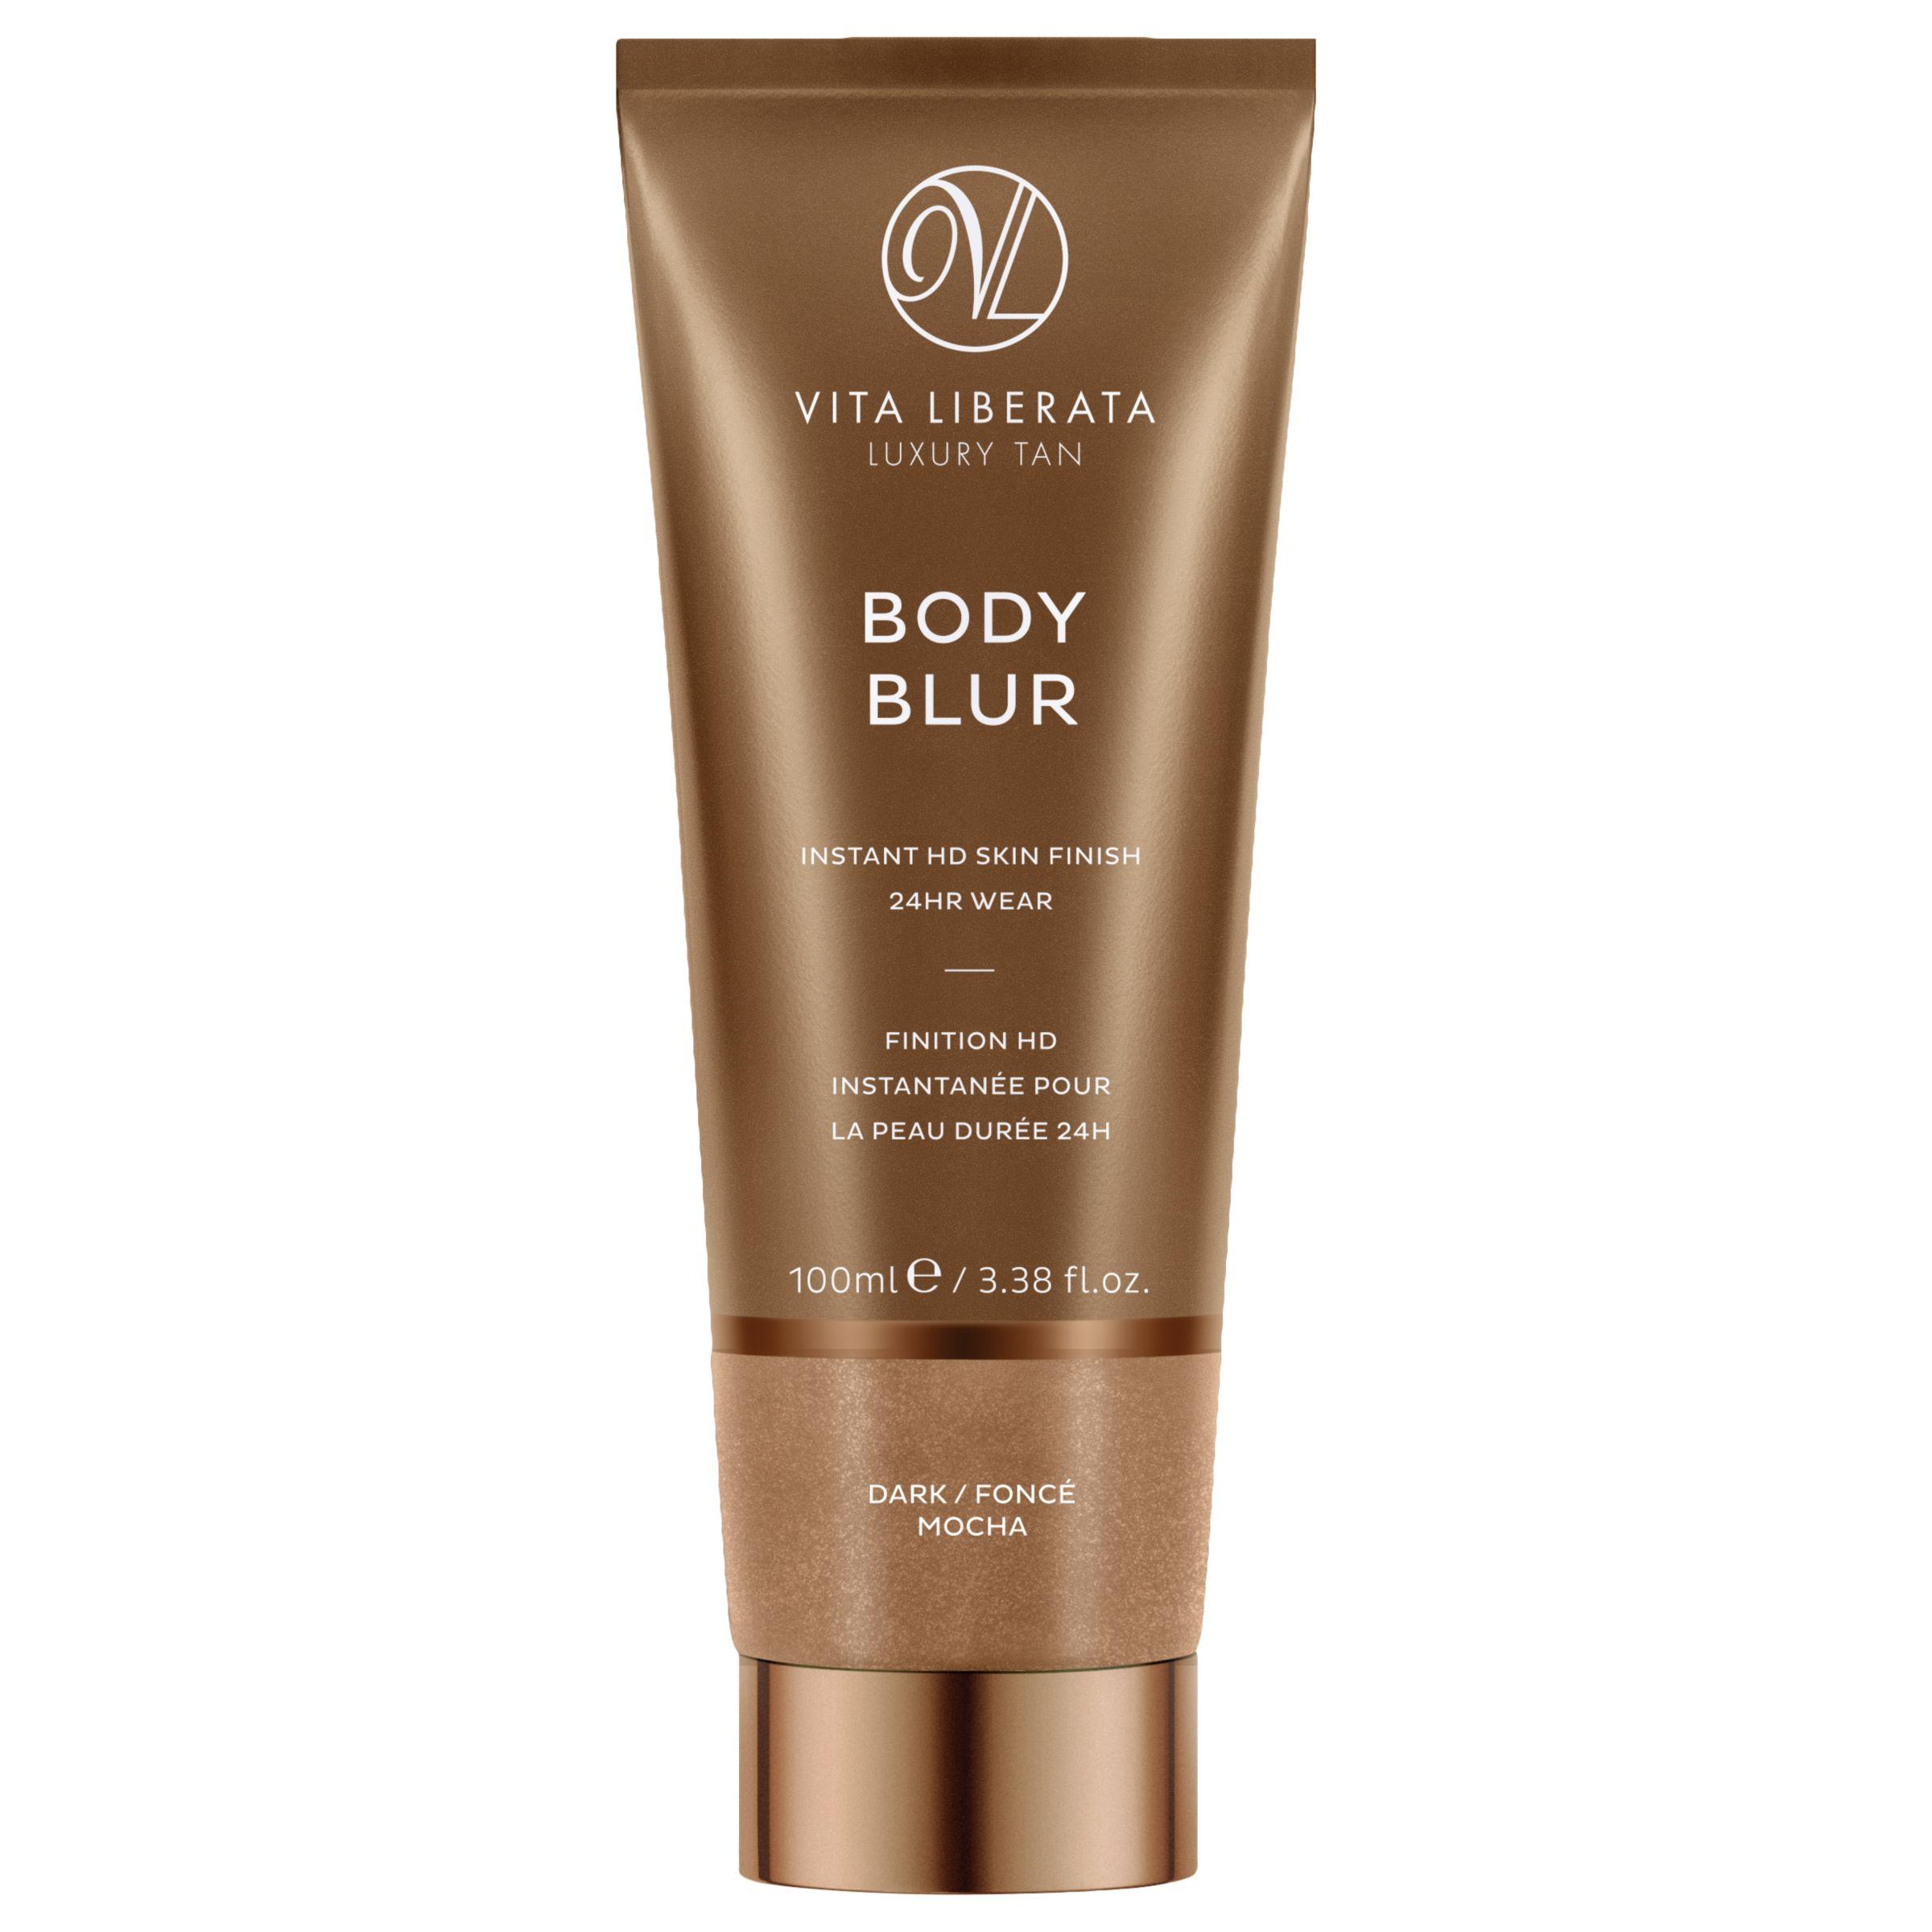 Vita Liberata Vita Liberata Body Blur Instant HD Skin Finish, 100ml